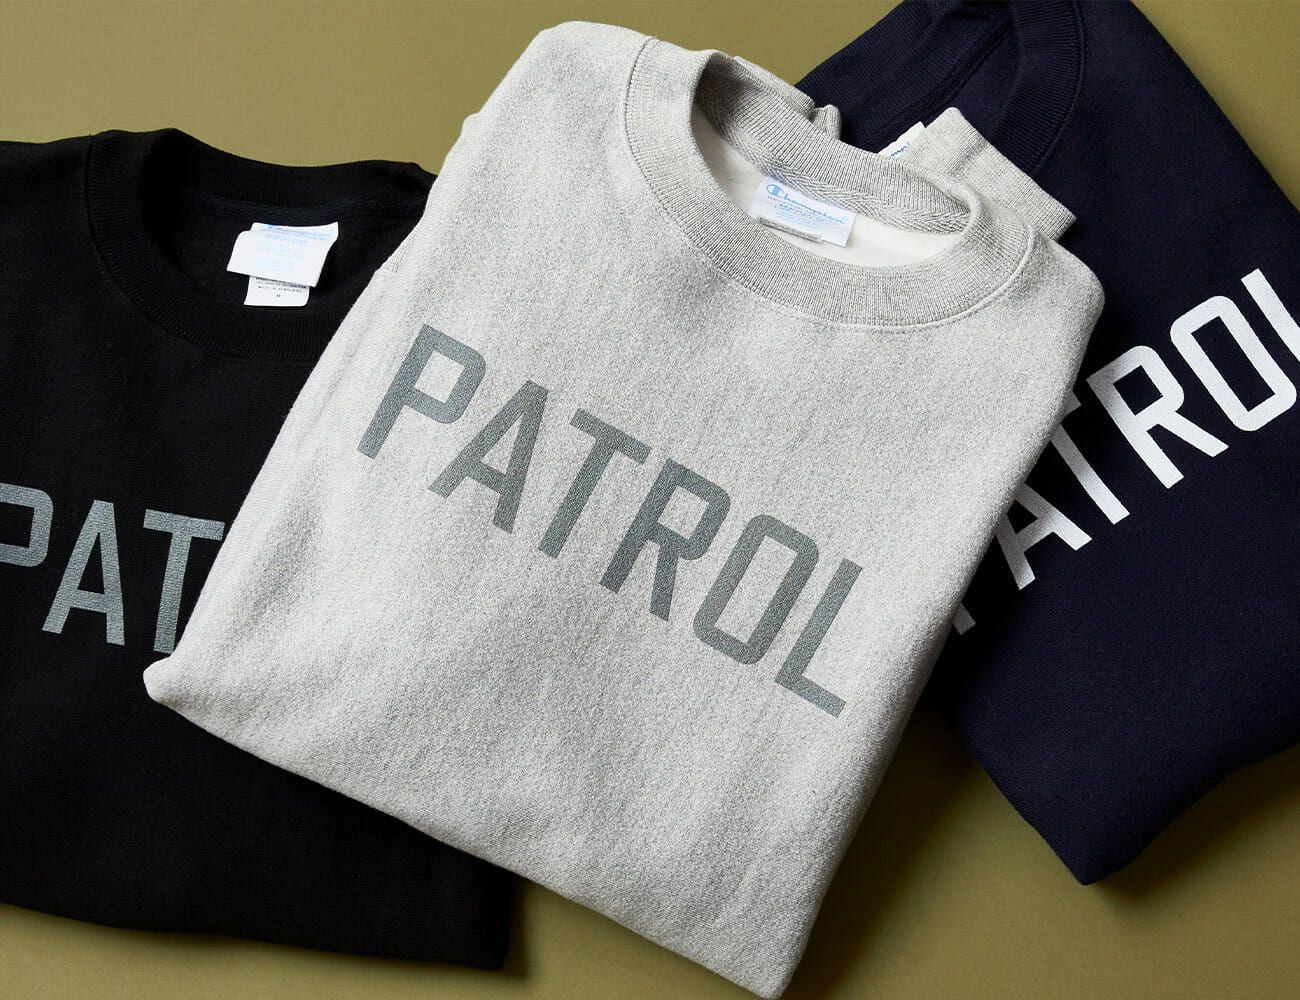 PATROL Sweatshirts